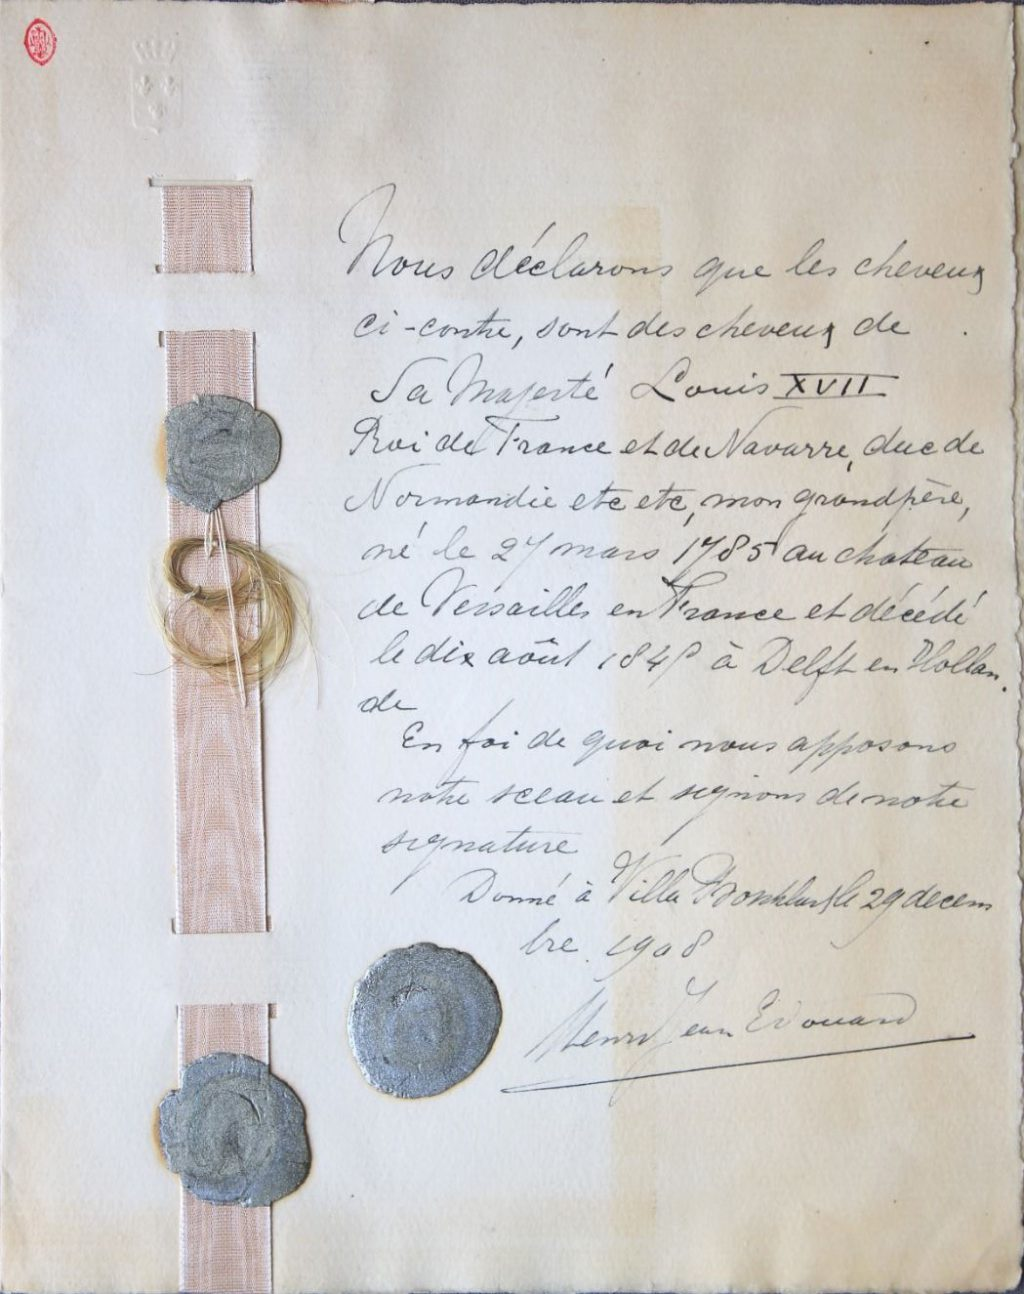 Bewaarde haarlok uit het dossier van Karl Wilhelm Naundorff (Archief 513, inv.nr 85)